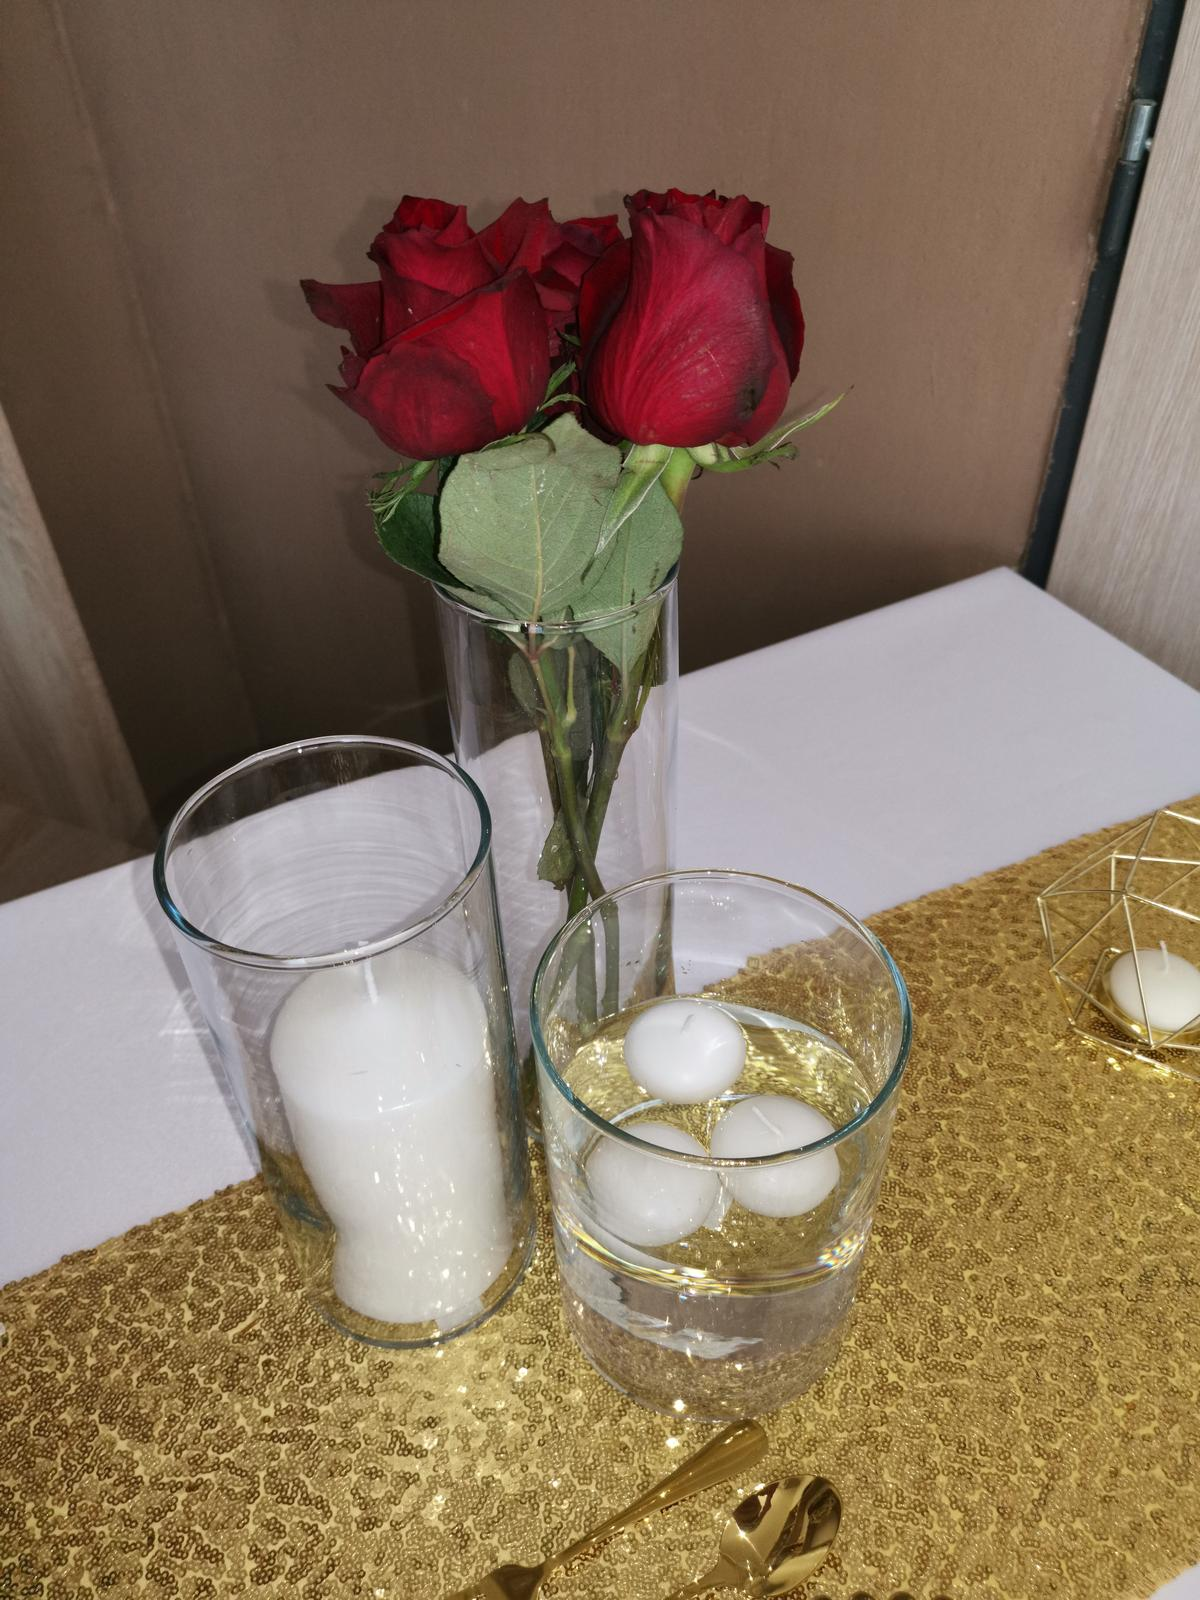 Svietniky a váza  - Obrázok č. 1